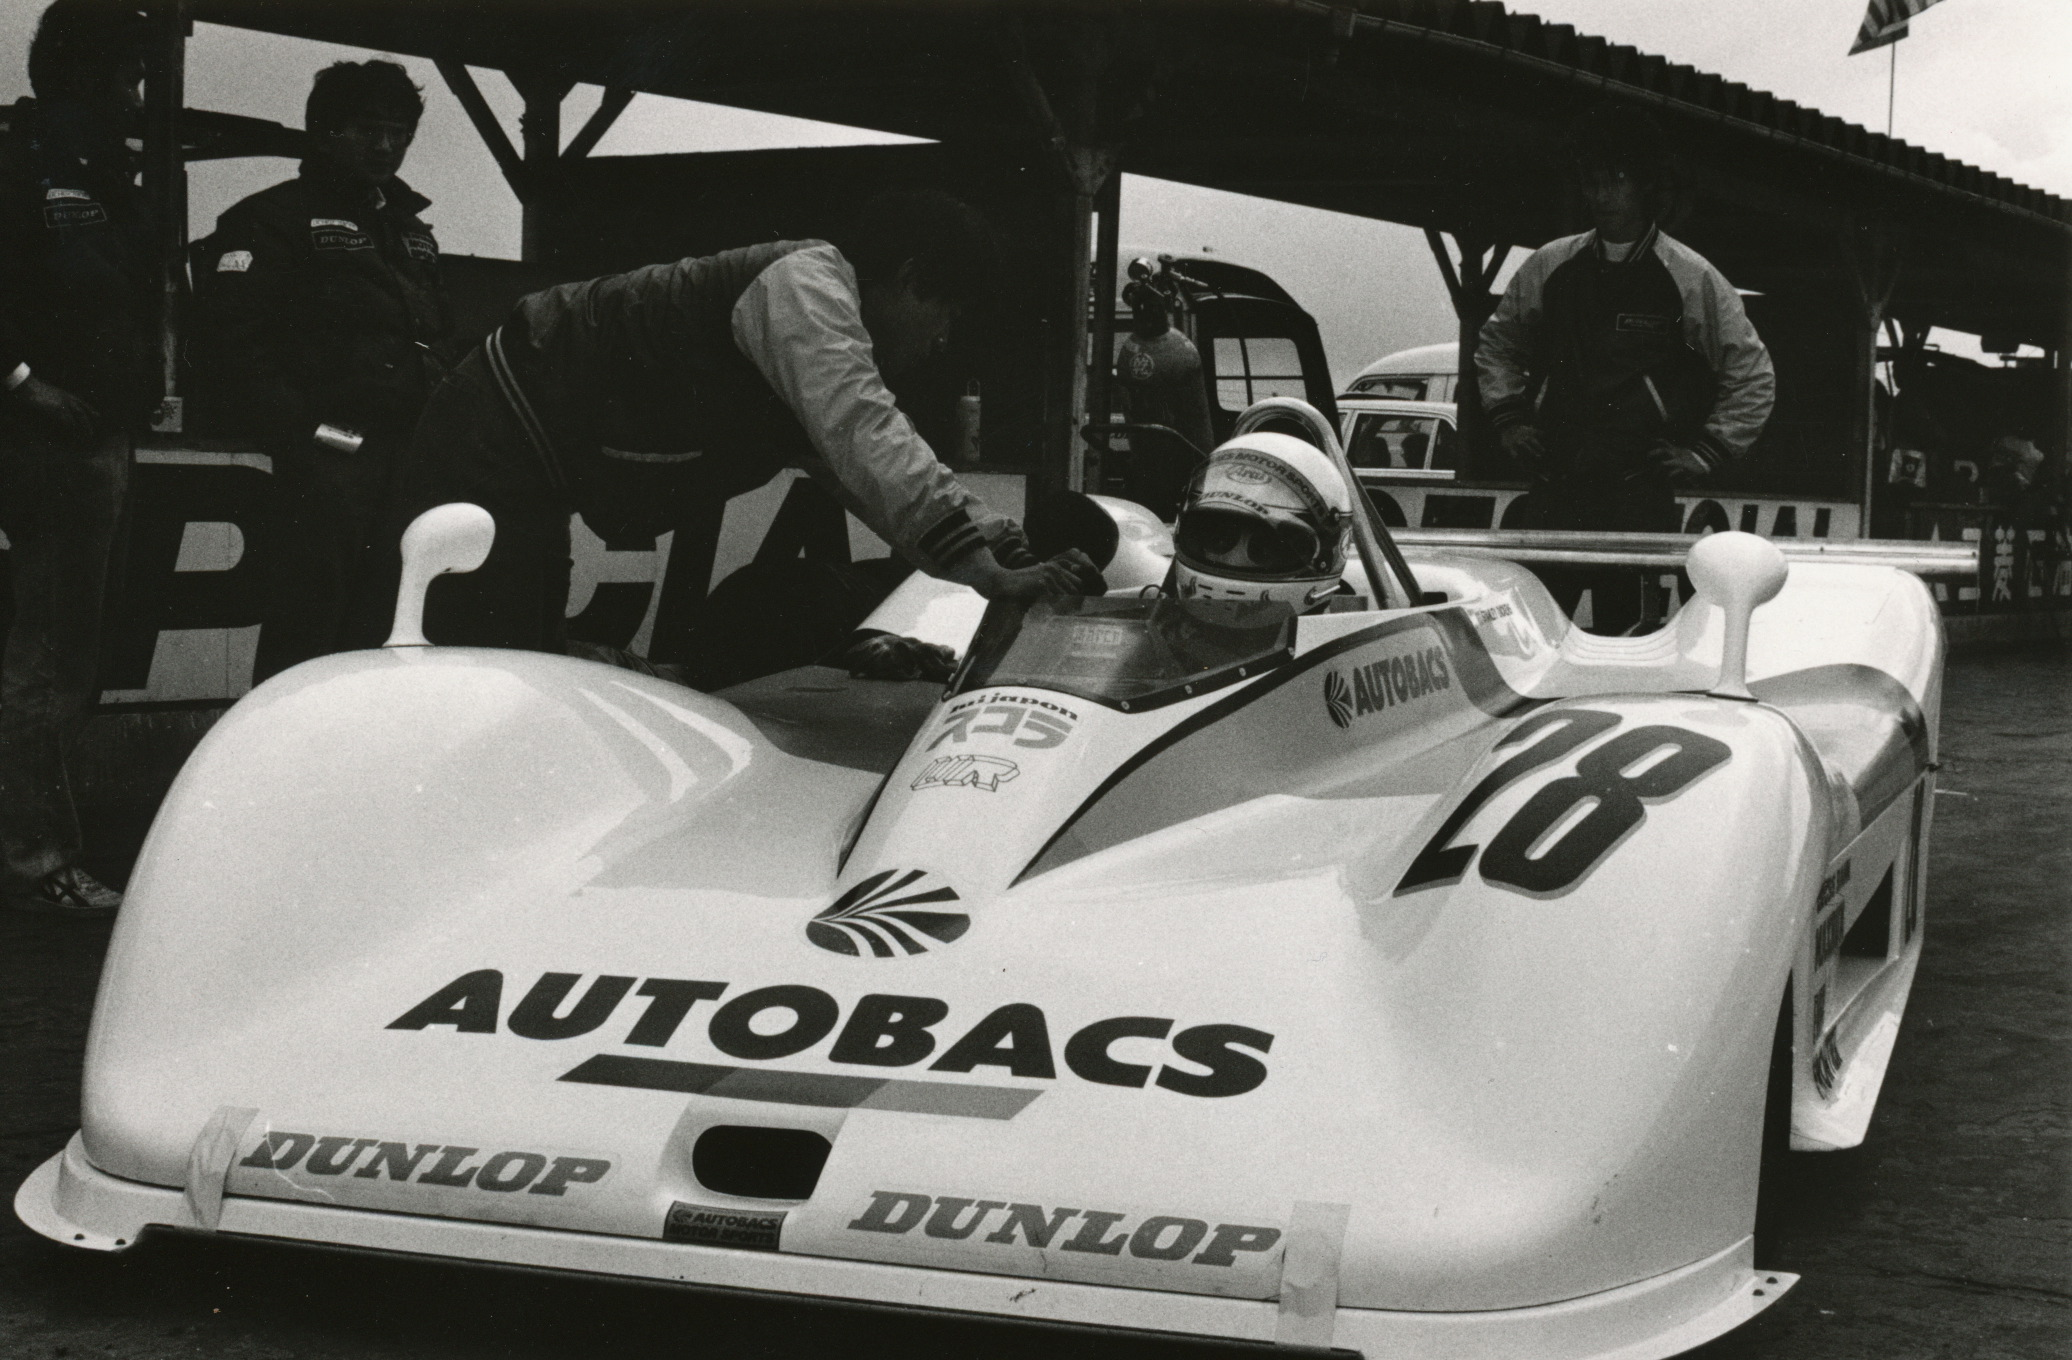 Grand Champion Japan 1984